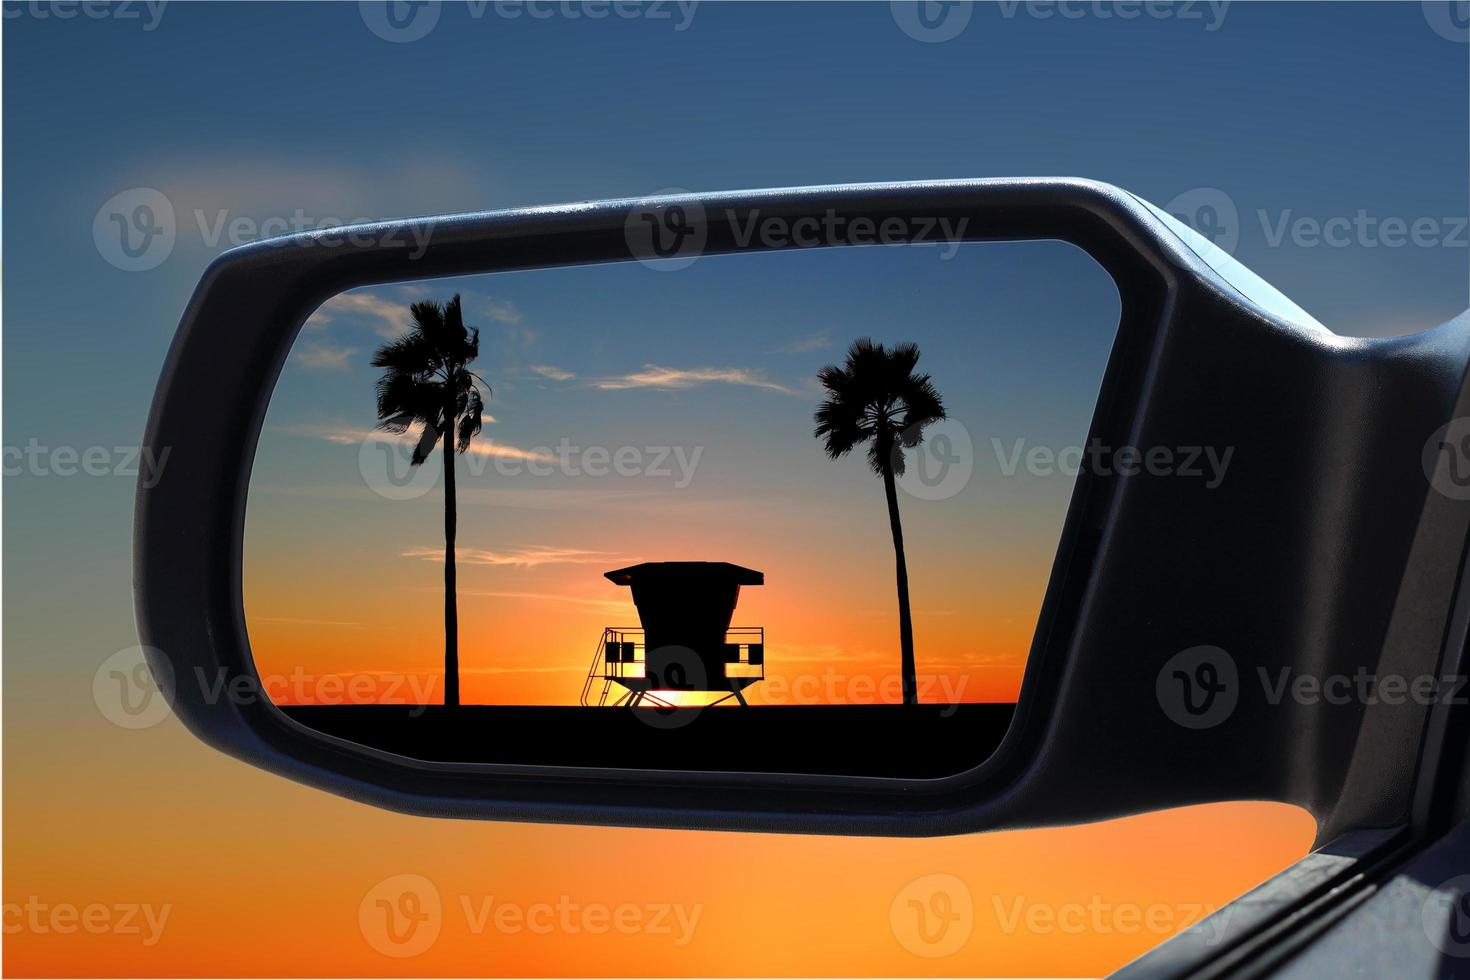 Rearview mirror photo